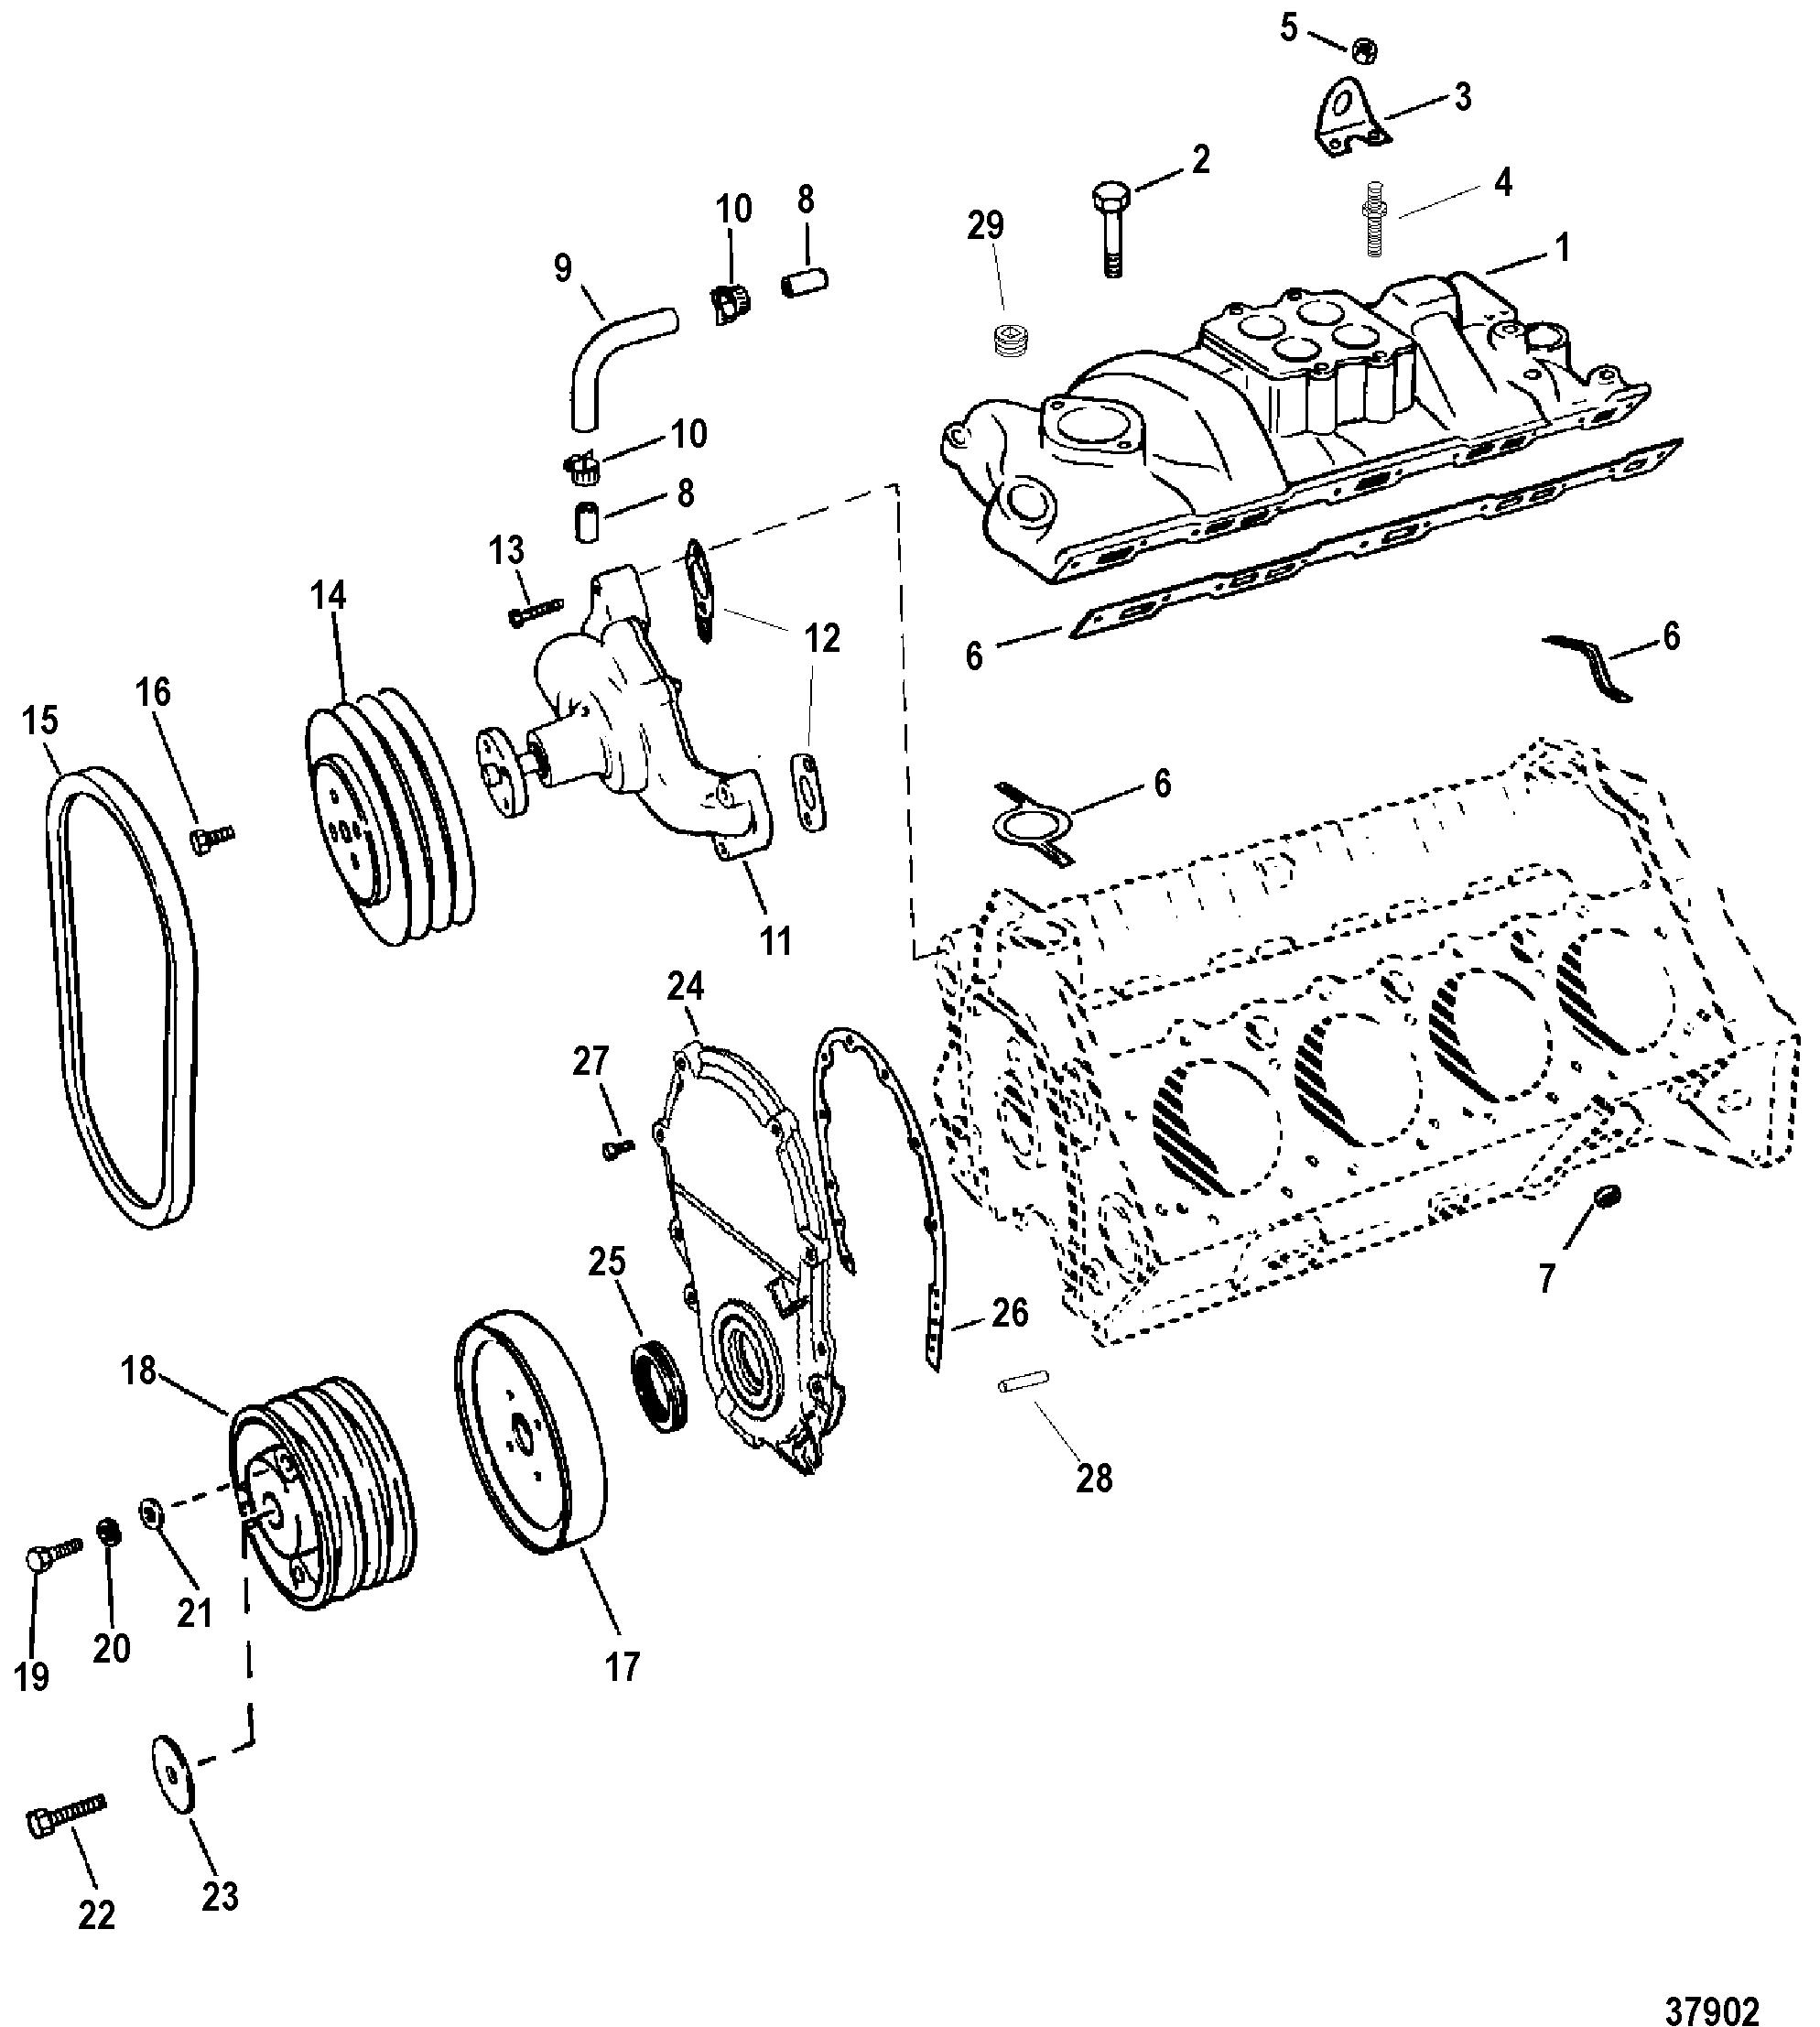 Hardin Marine Intake Manifold And Front Cover 10 Pin Mercruiser Wiring Harness 454 Mag Bravo Gen 5 Gm V 8 1996 1997 Serial 0f801700 Thru 0k999999